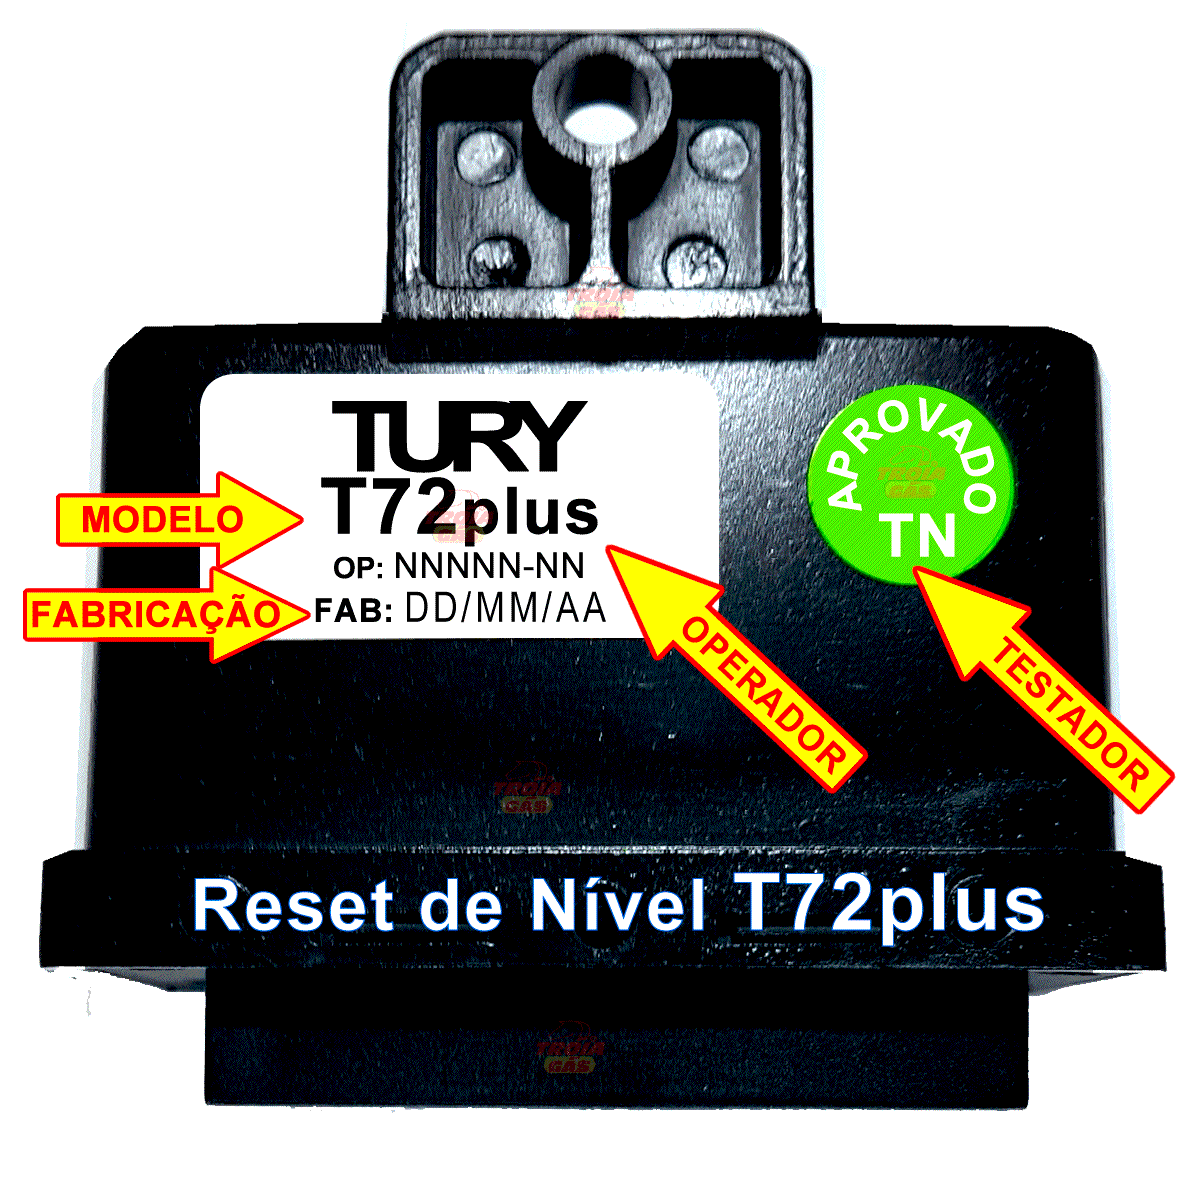 Reset T72 PLUS RETESTADO Nível Combustível TURY GAS